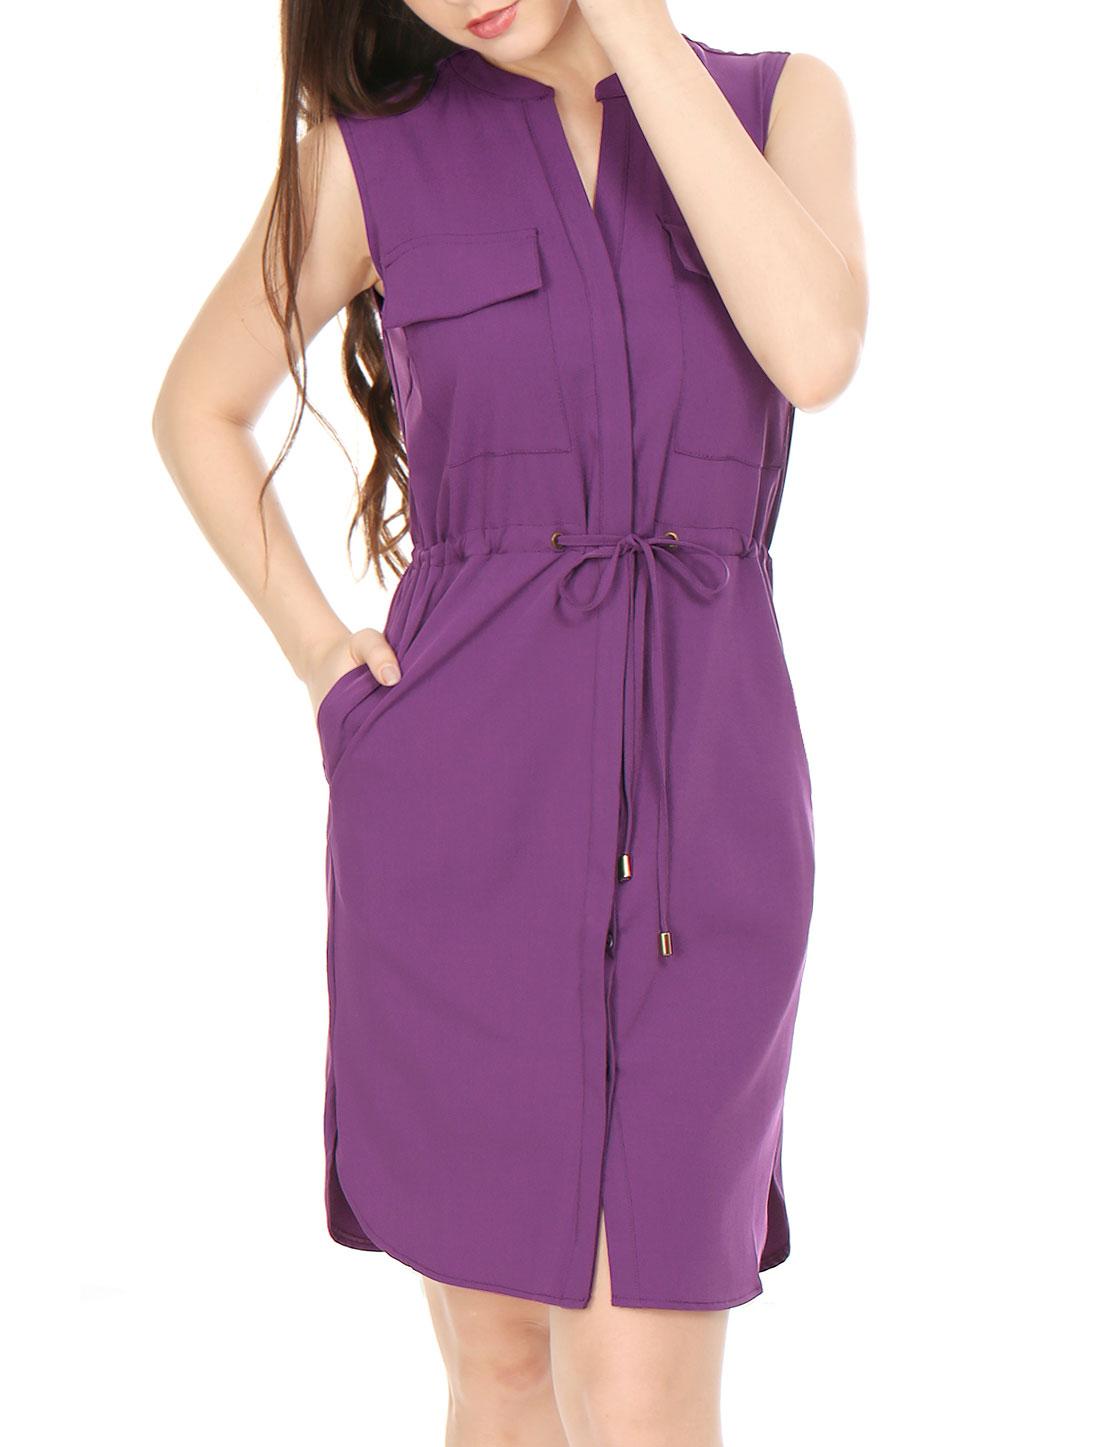 Allegra K Woman Single Breasted Drawstring Sleeveless Dress Purple M